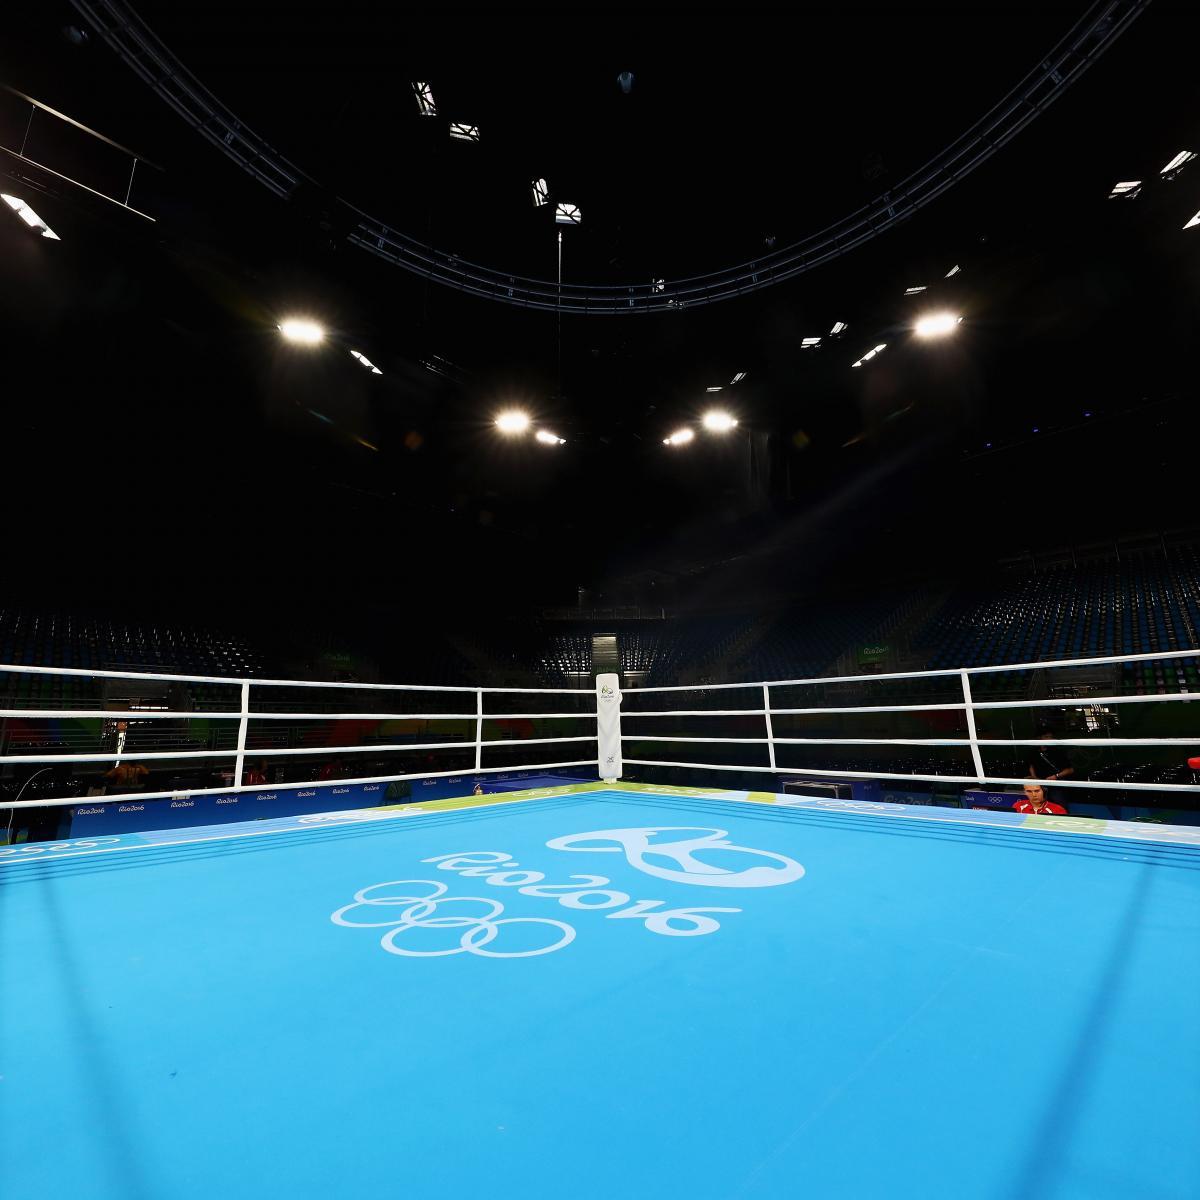 14-year-old kickboxer dies during fight